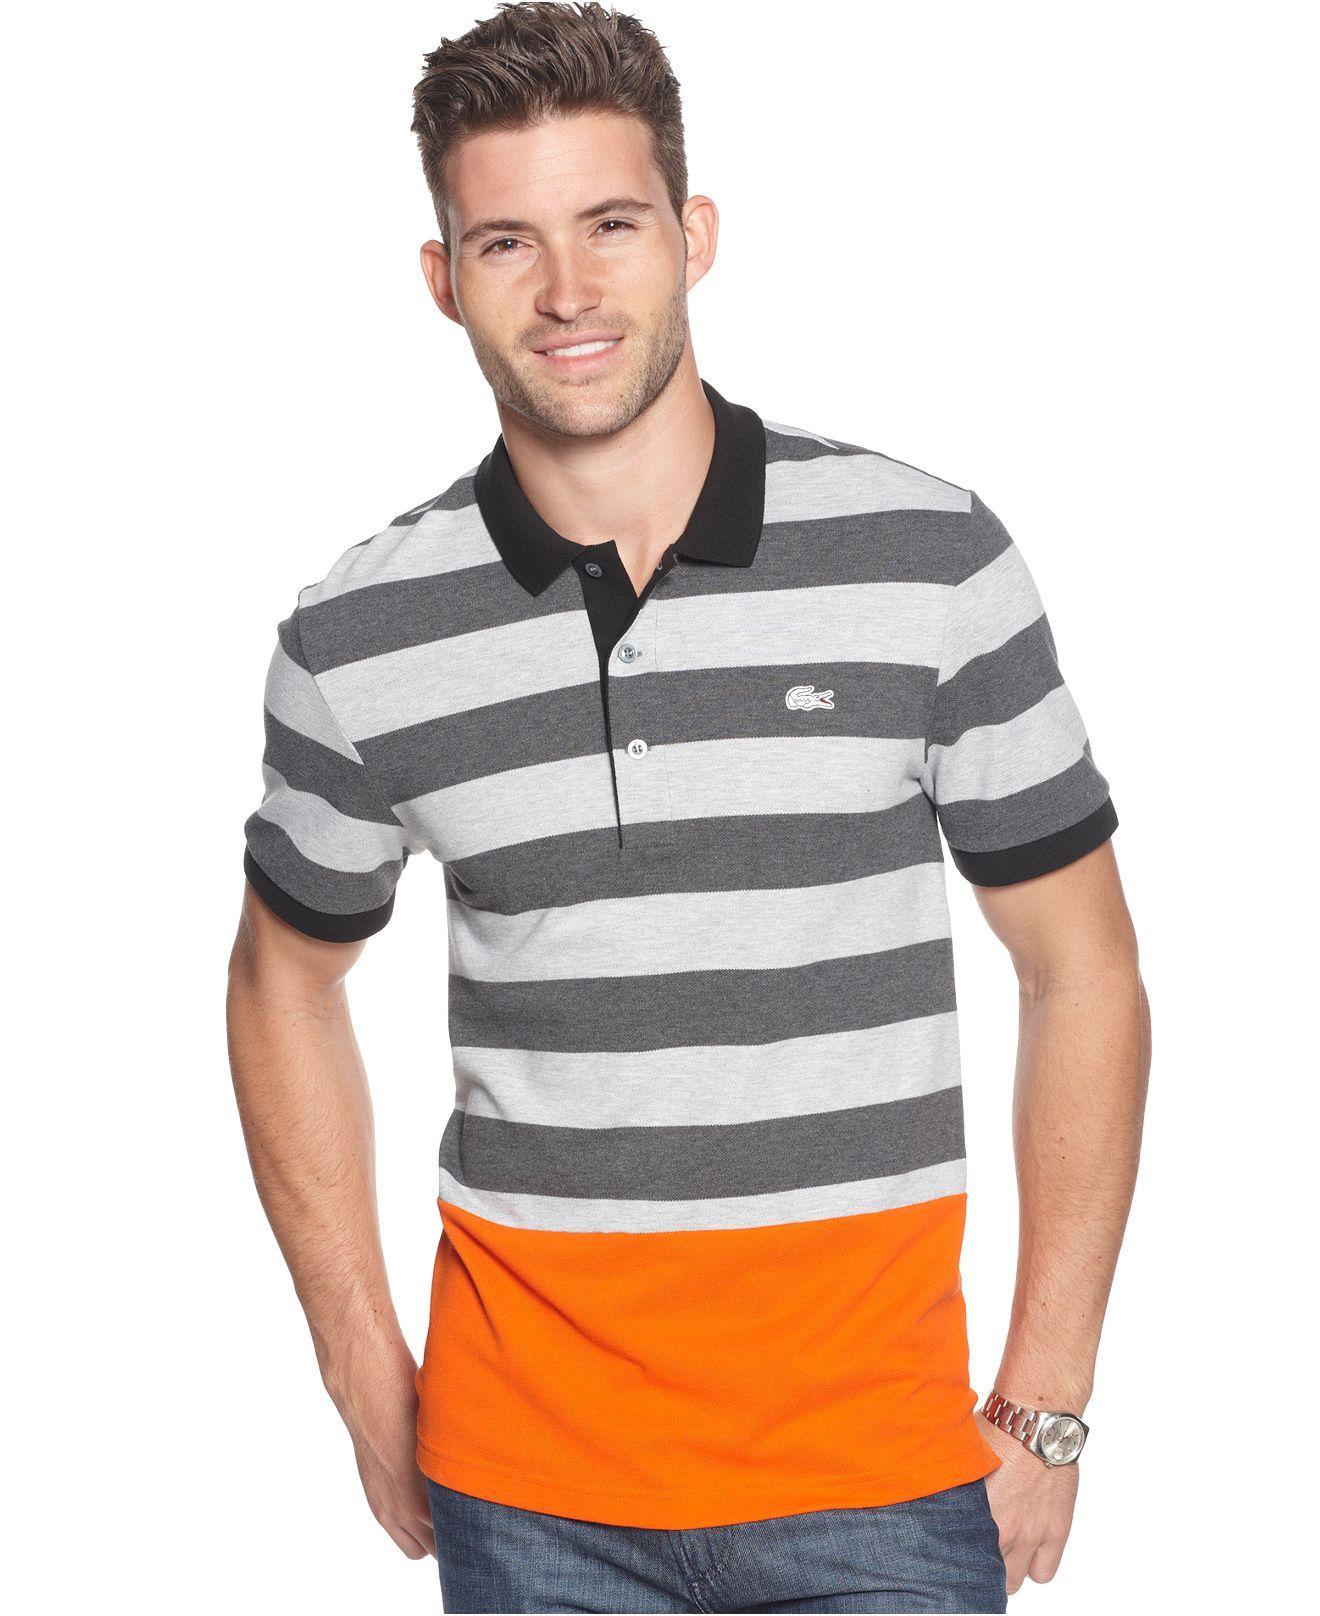 lacoste shirt mens orange